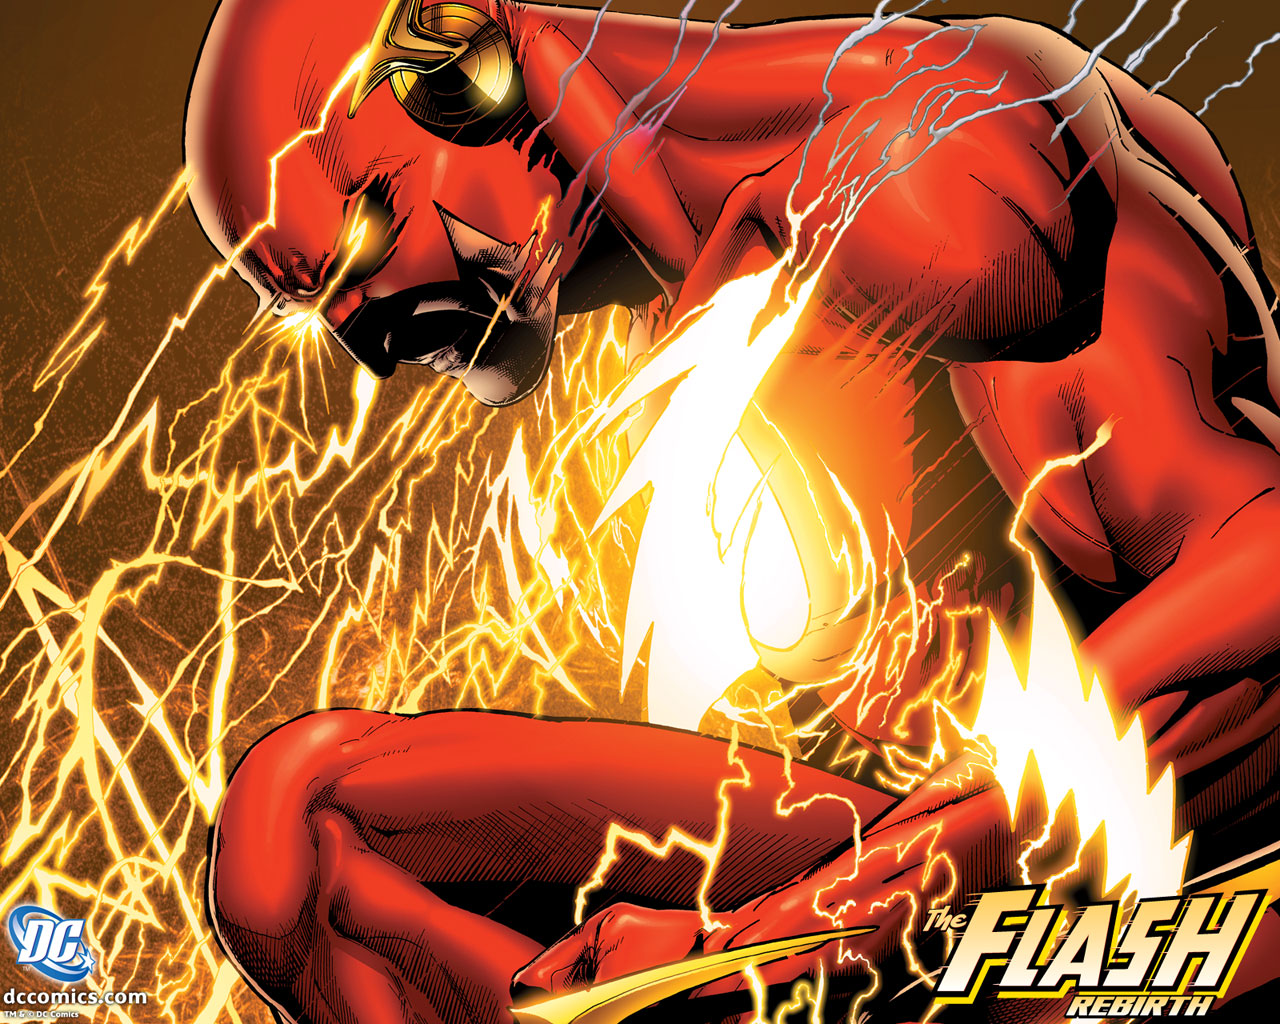 Underworld honduras my favorite dc superhero the flash - Super hero flash ...